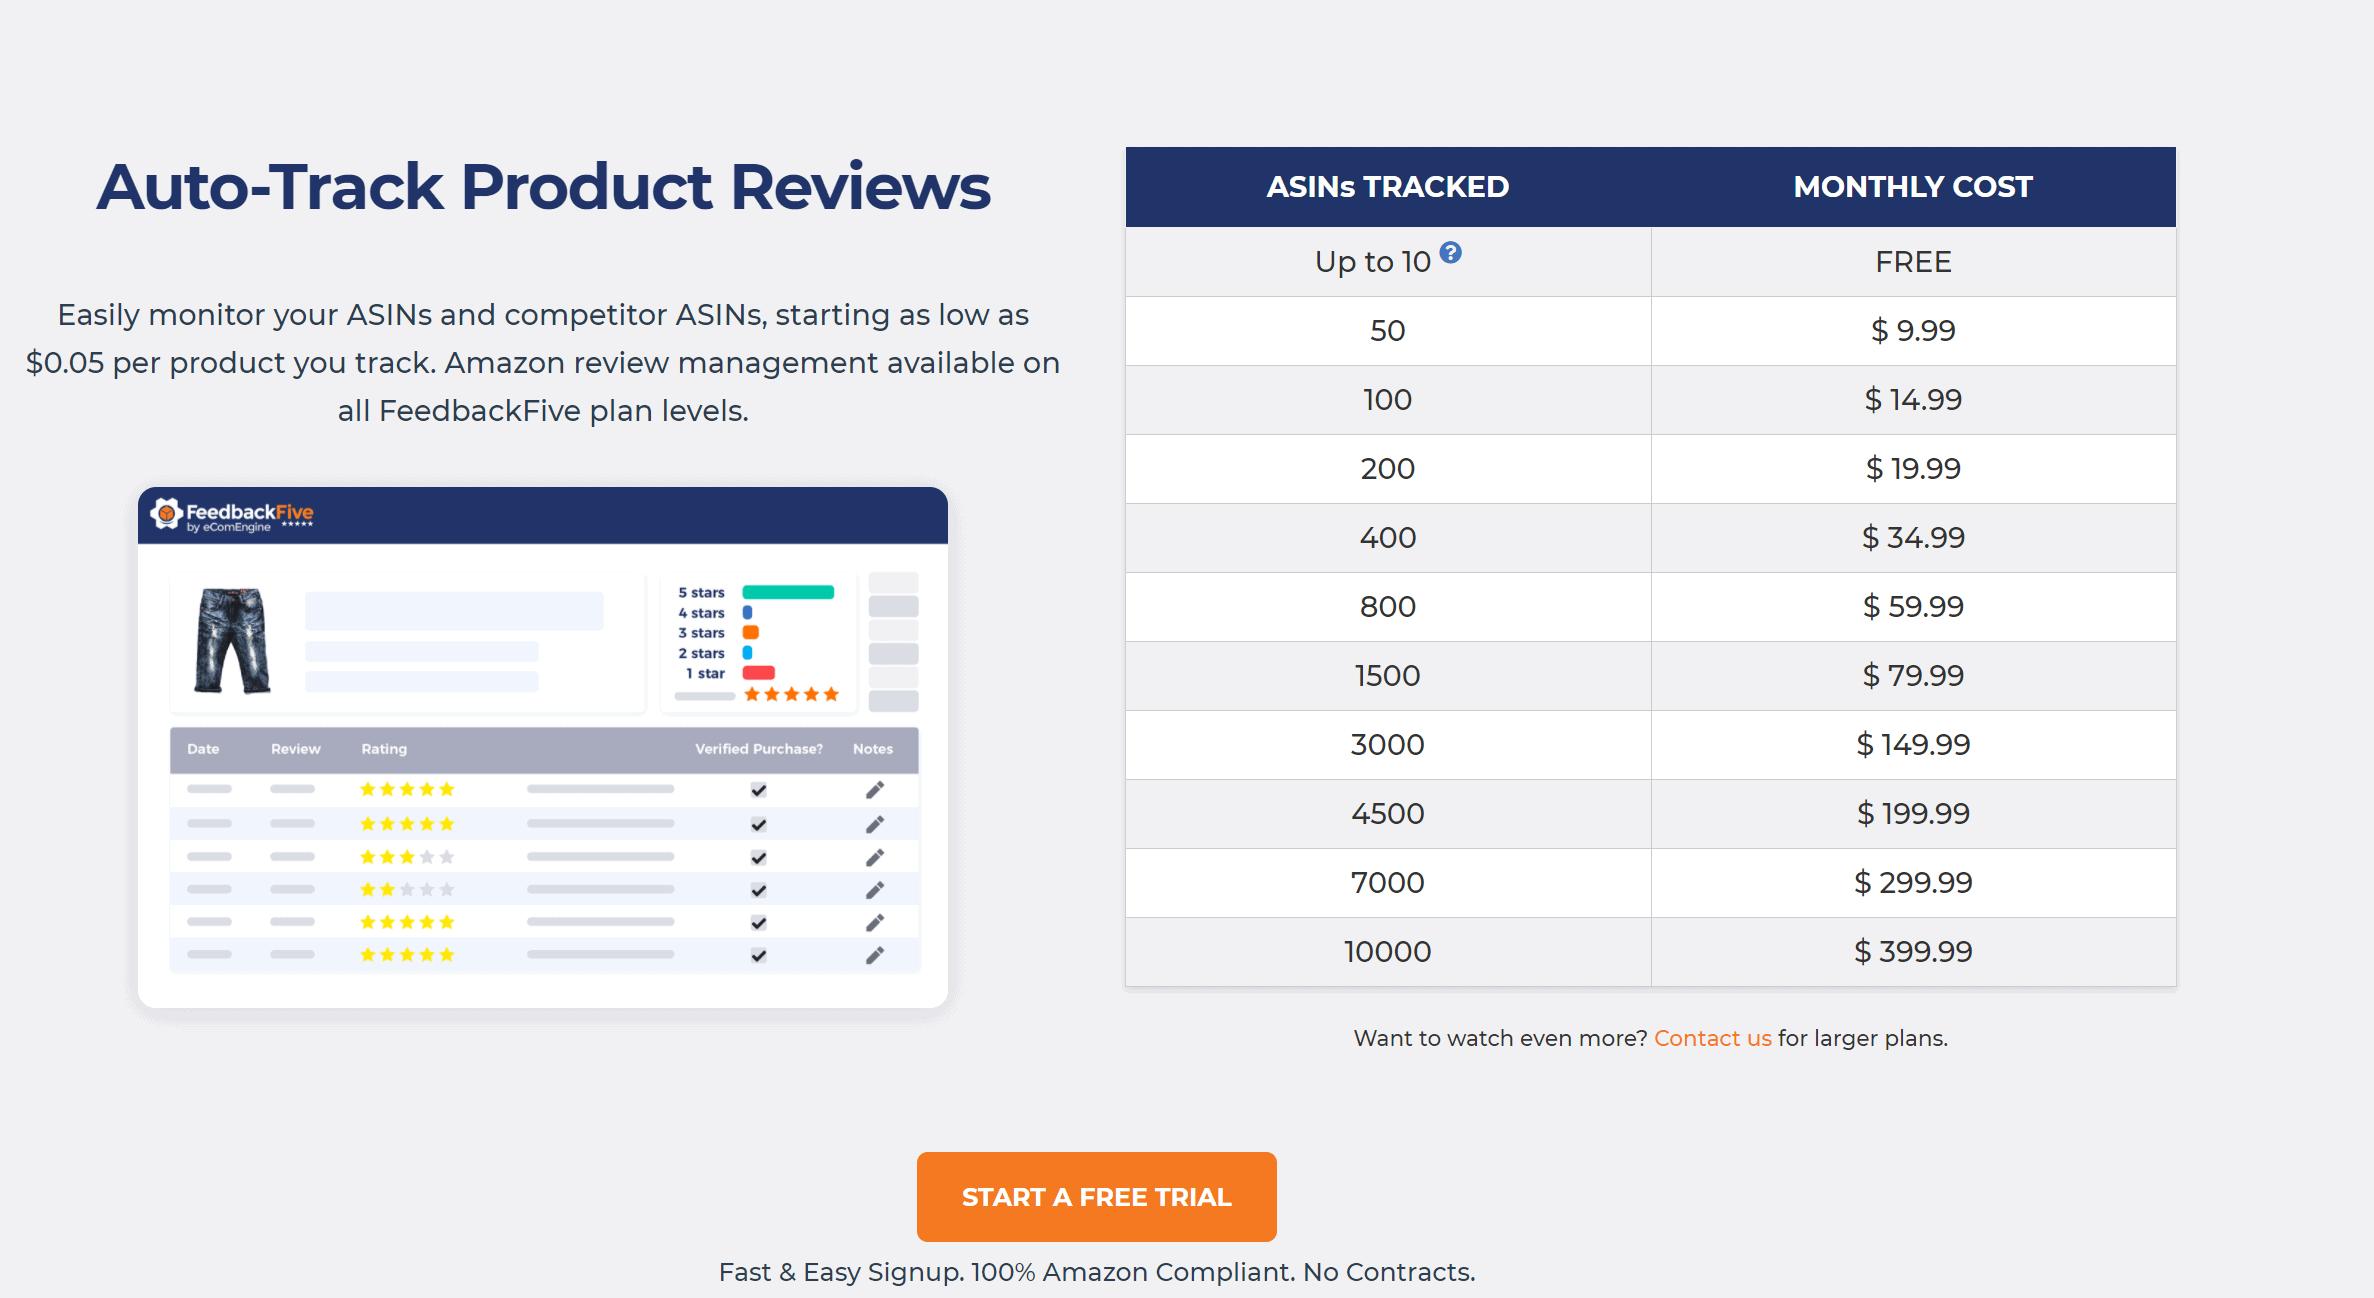 Feedbackfive reviews